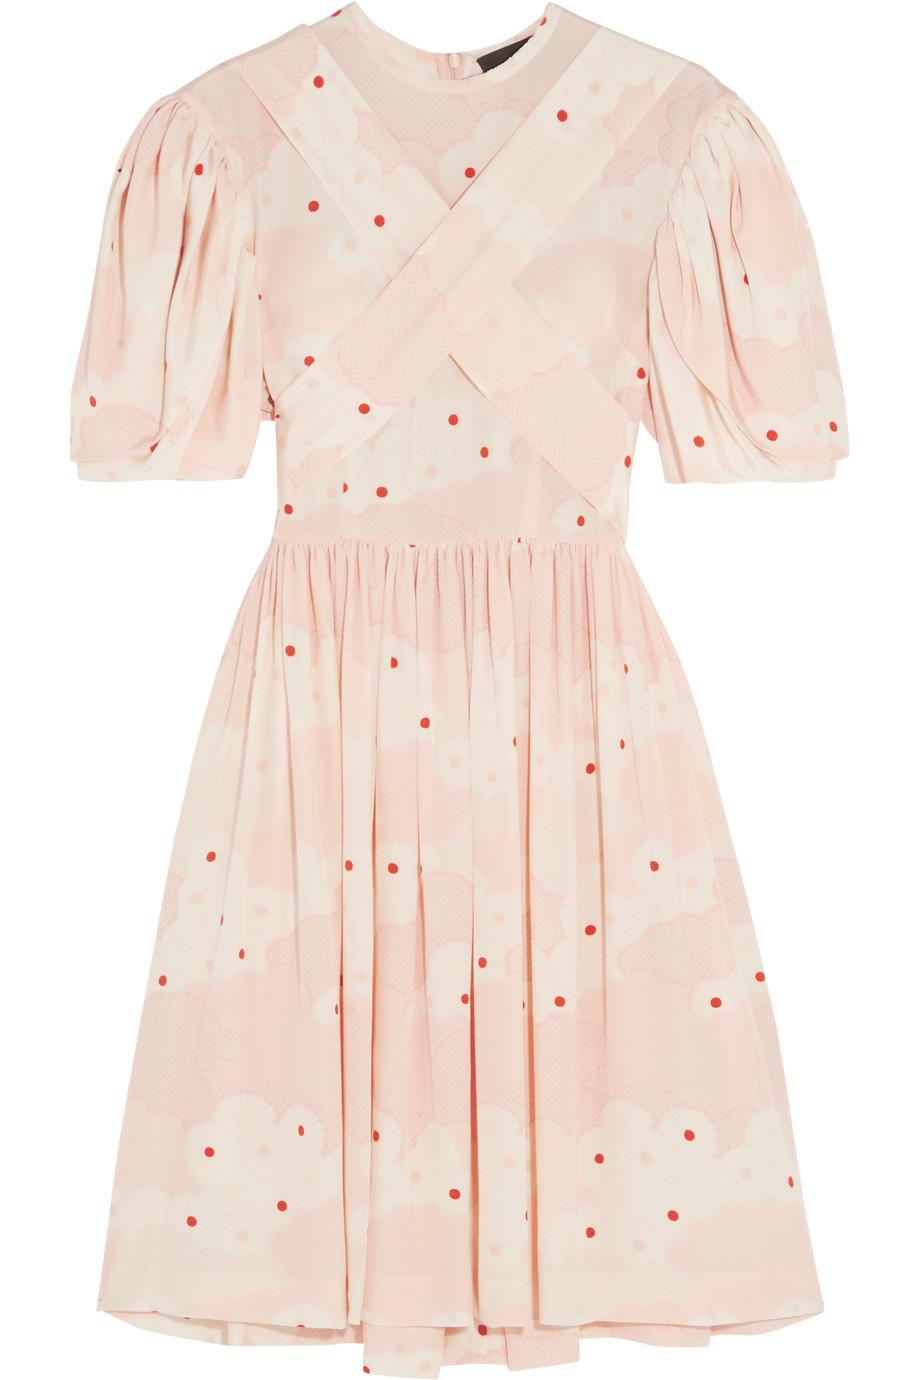 Simone Rocha Printed Silk Mini Dress, Blush, Women's - Printed, Size: 6